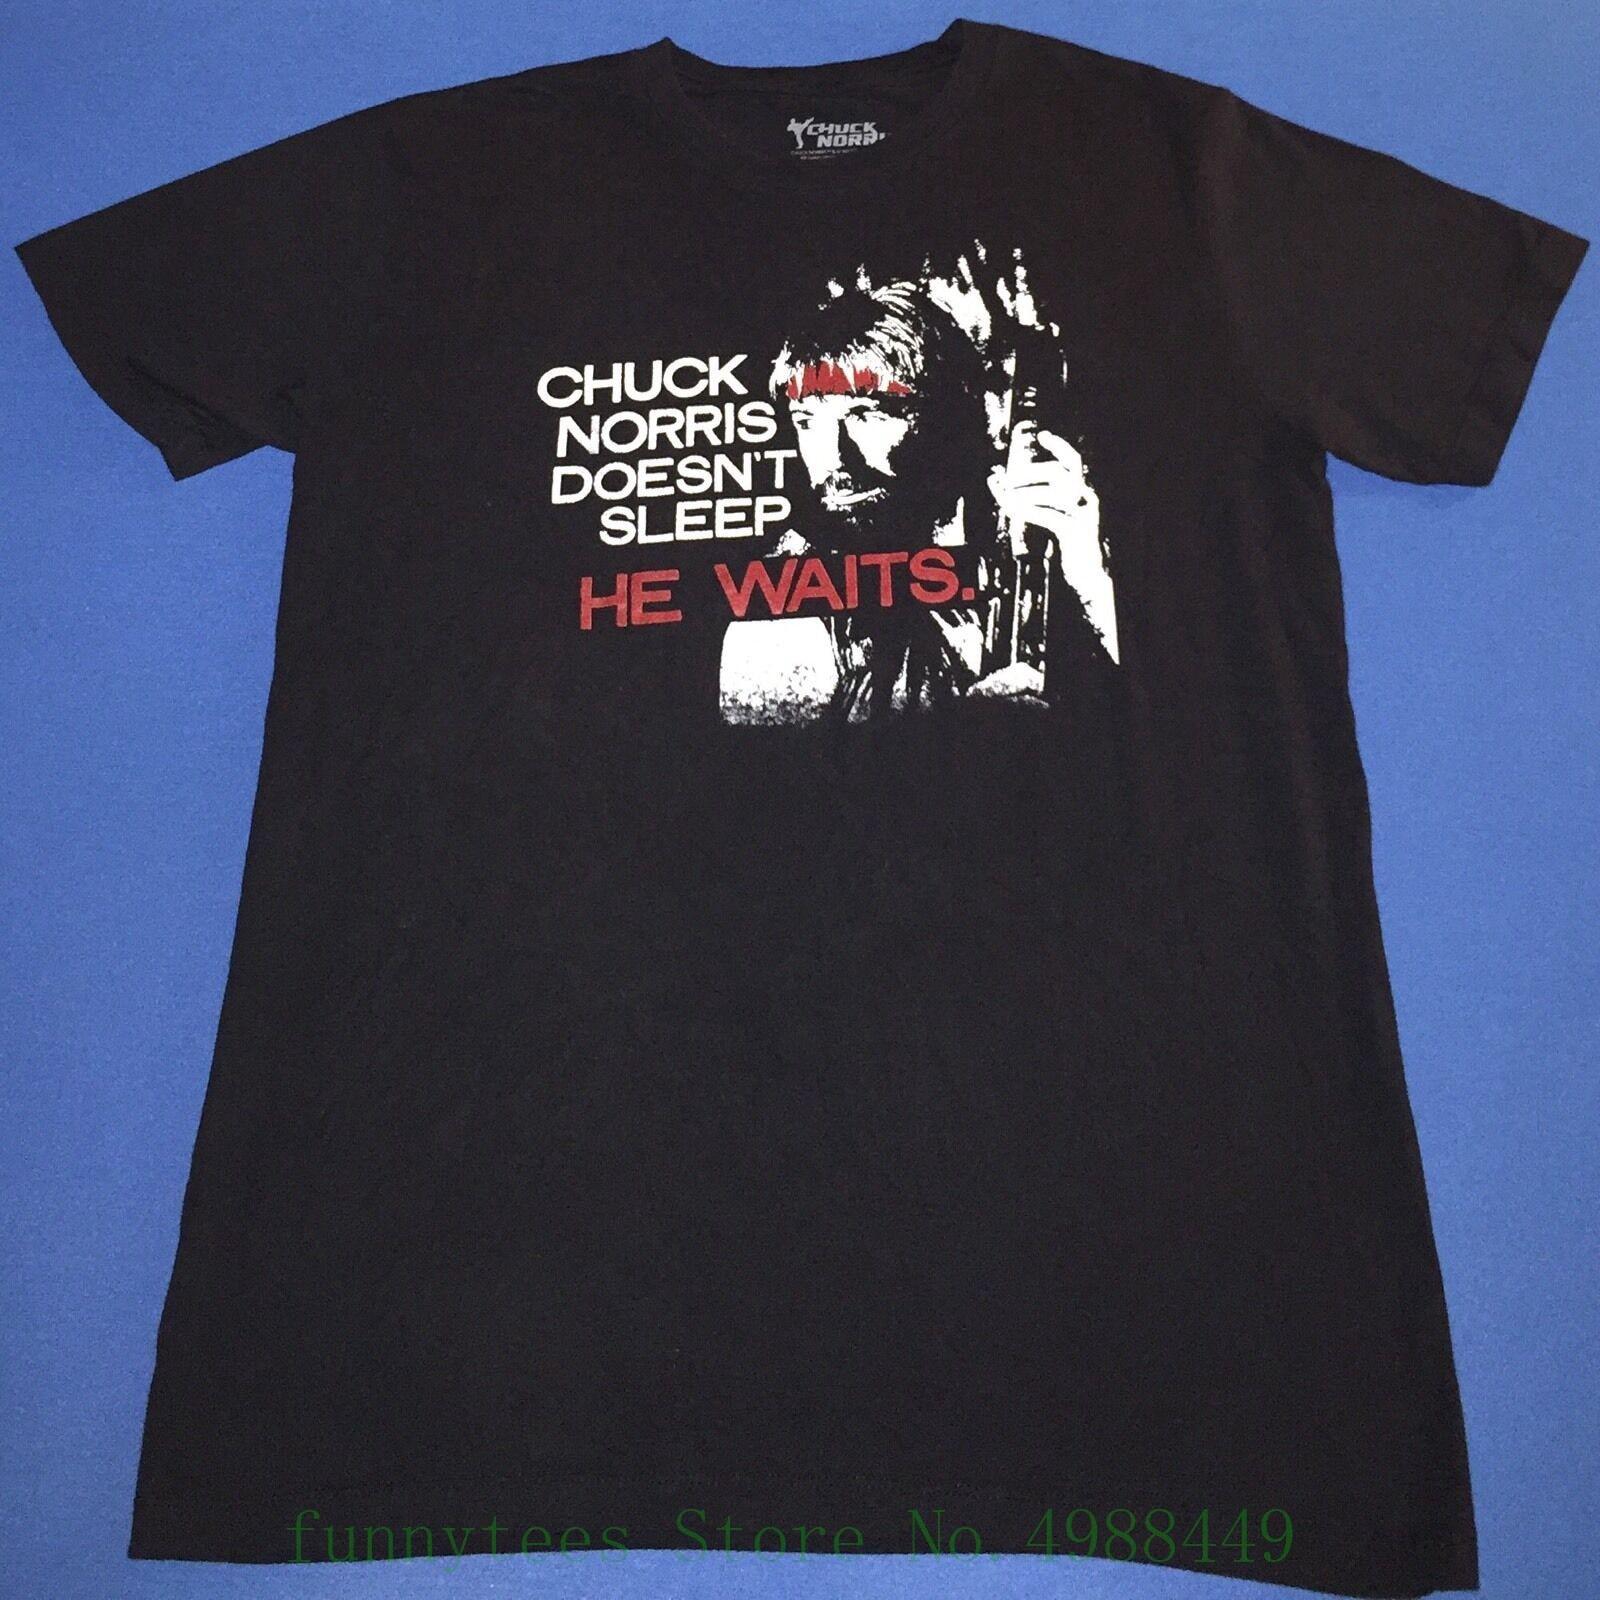 Camiseta negra Chuck Norris dolls Sleep He Waits para hombre, camisetas grandes a la moda de verano